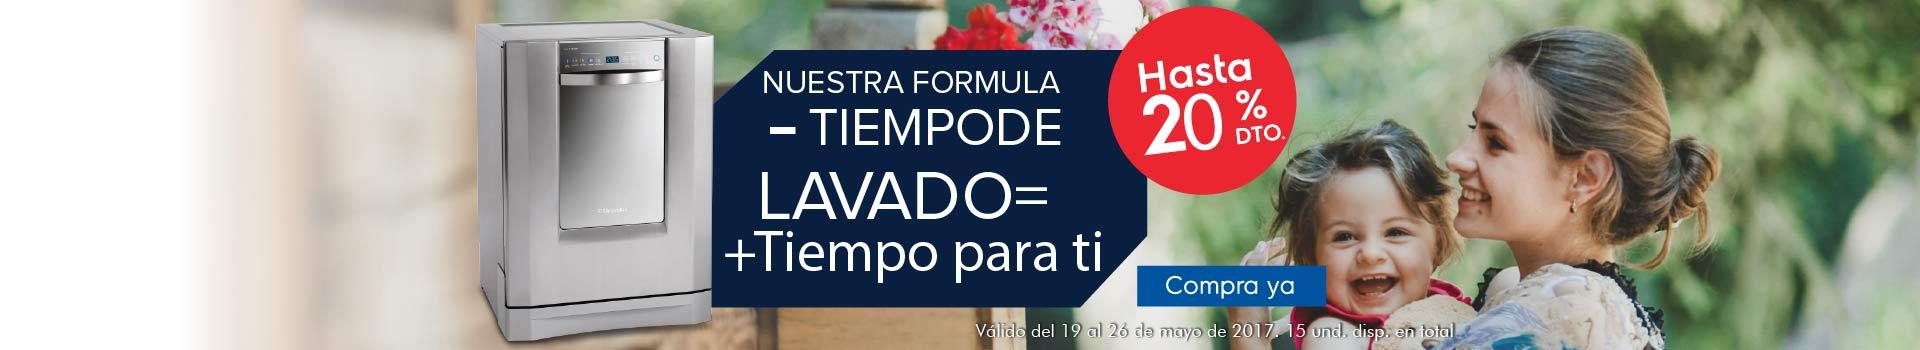 CAT LAVAPLAT - mayo 20 - Hasta 20%Dto en Lavaplatos ELECTROLUX